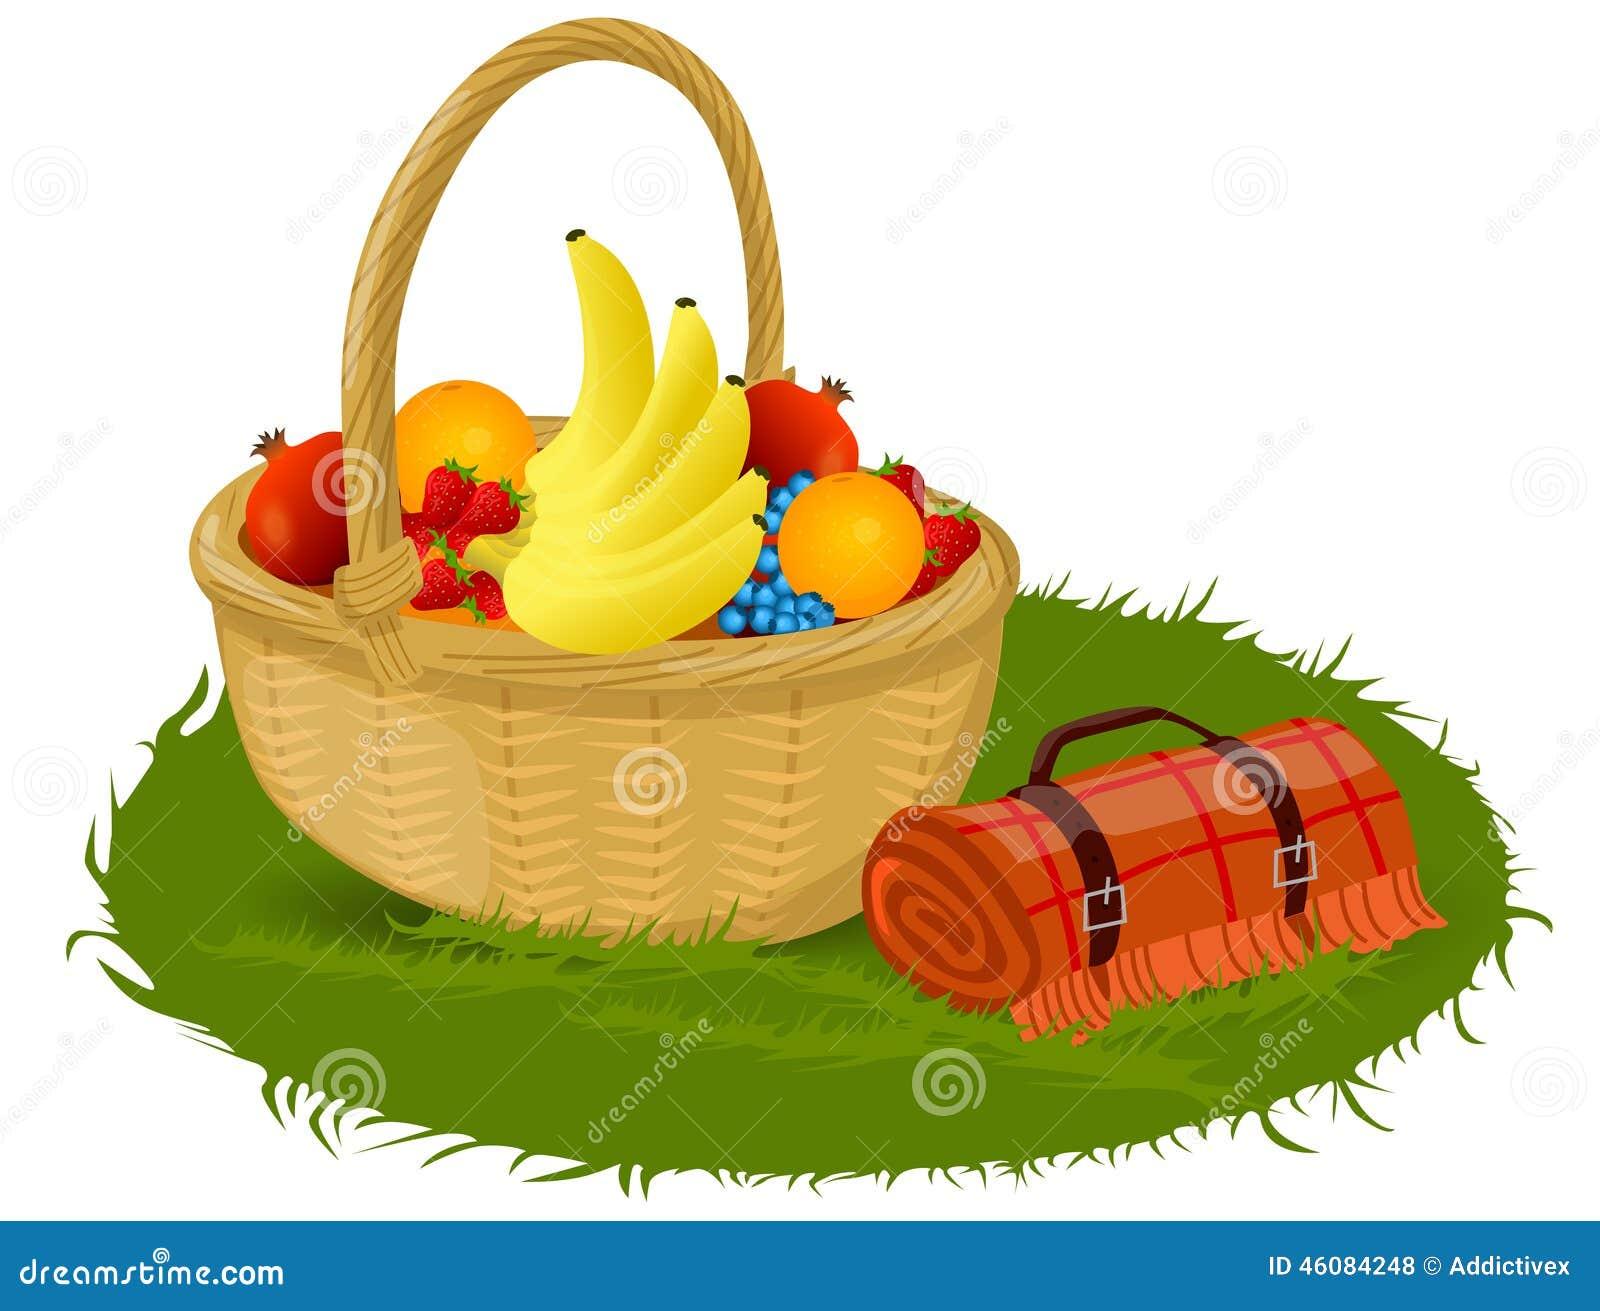 Picnic Basket Stock Vector Image 46084248